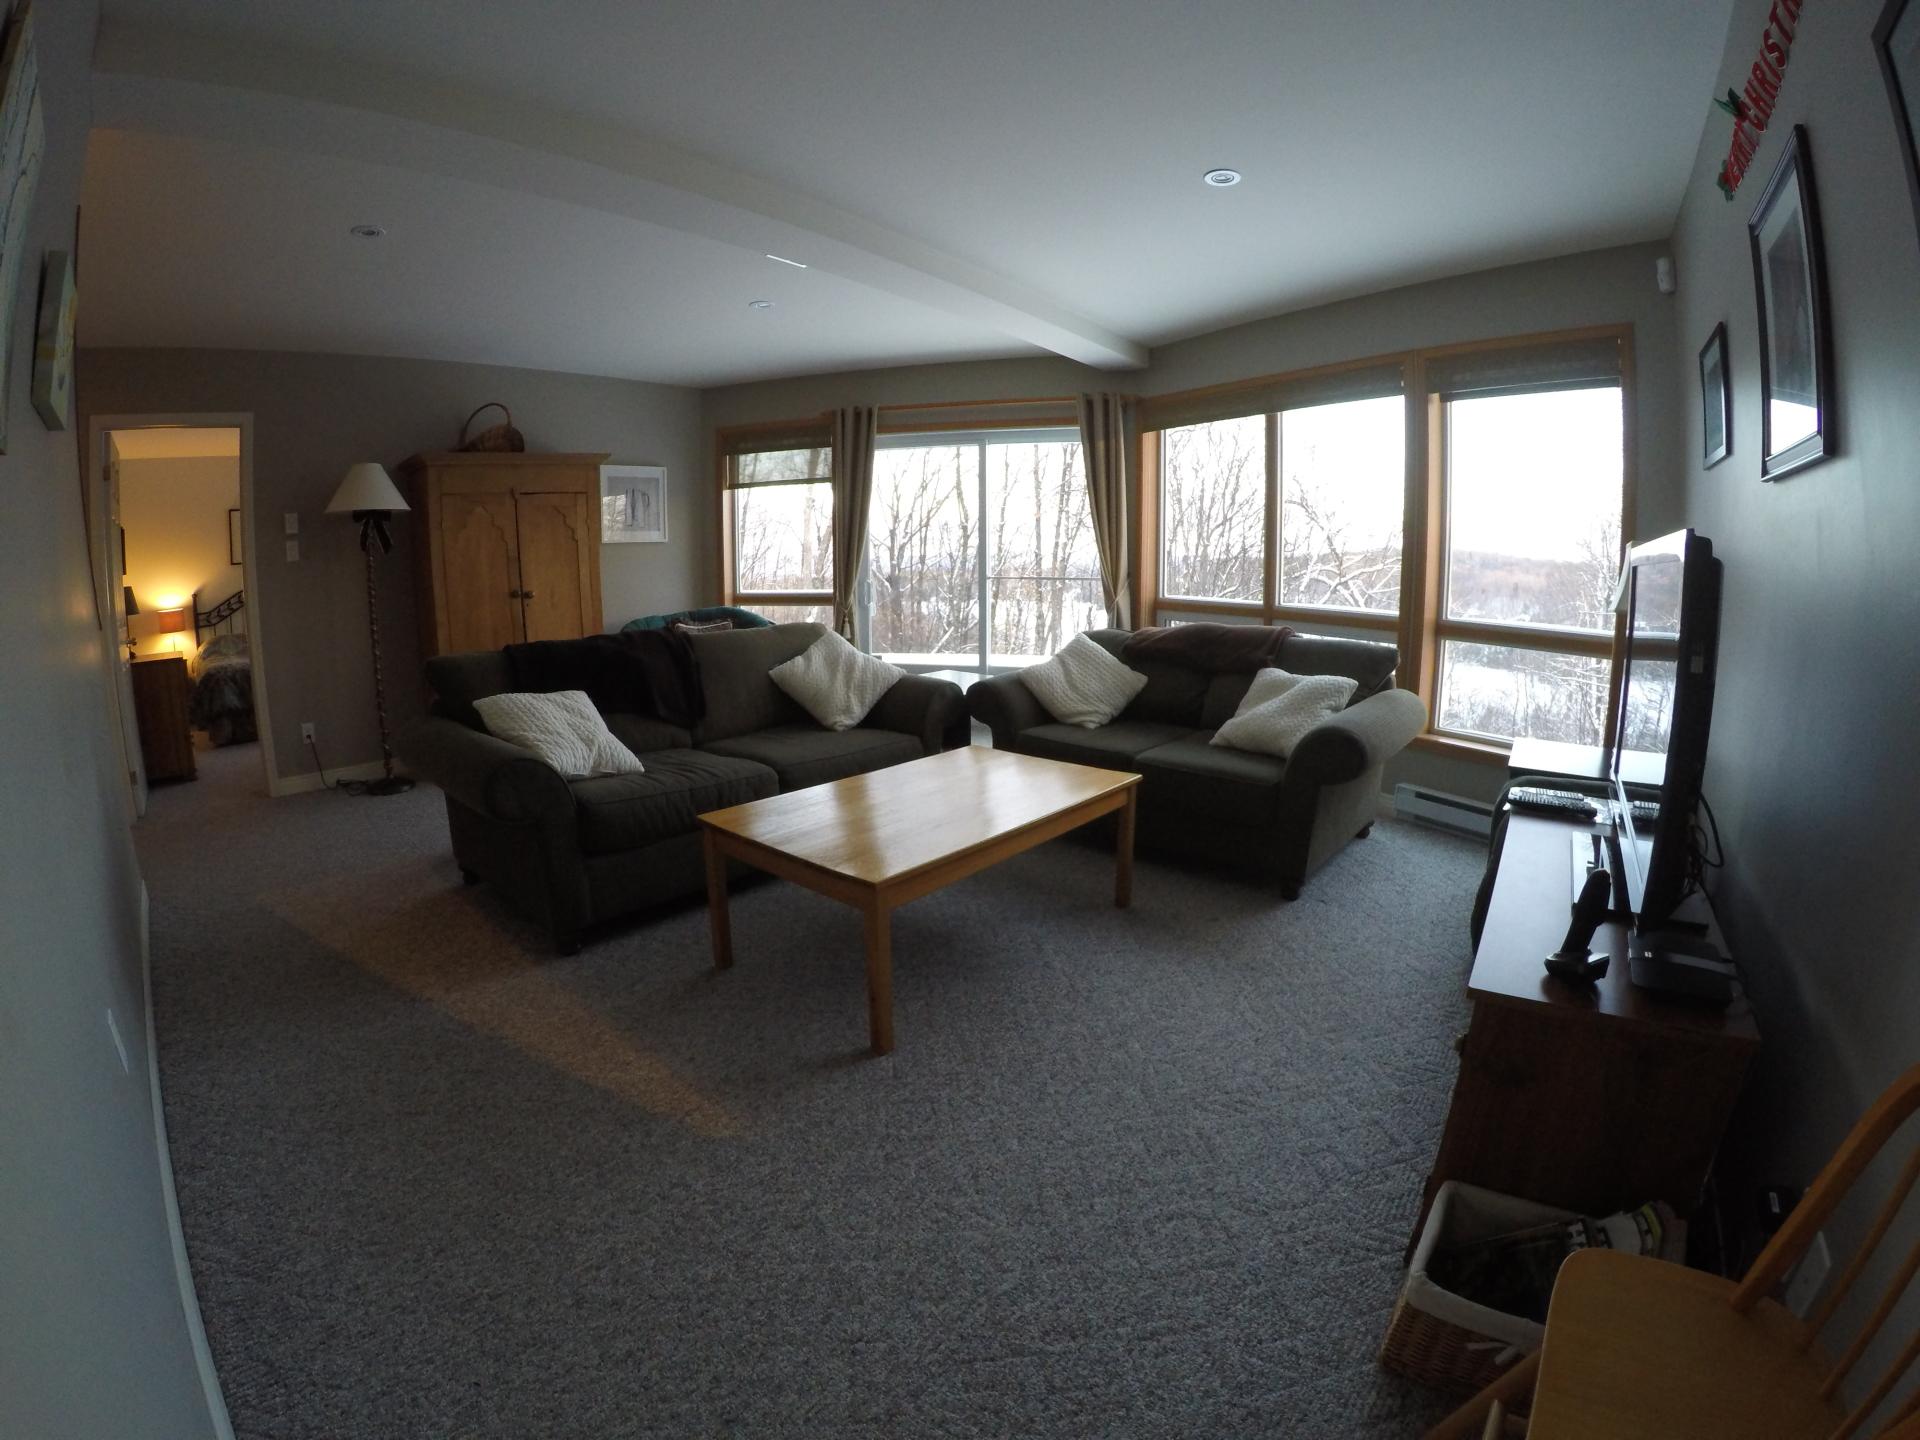 Salon en bas / downstairs livingroom with TV